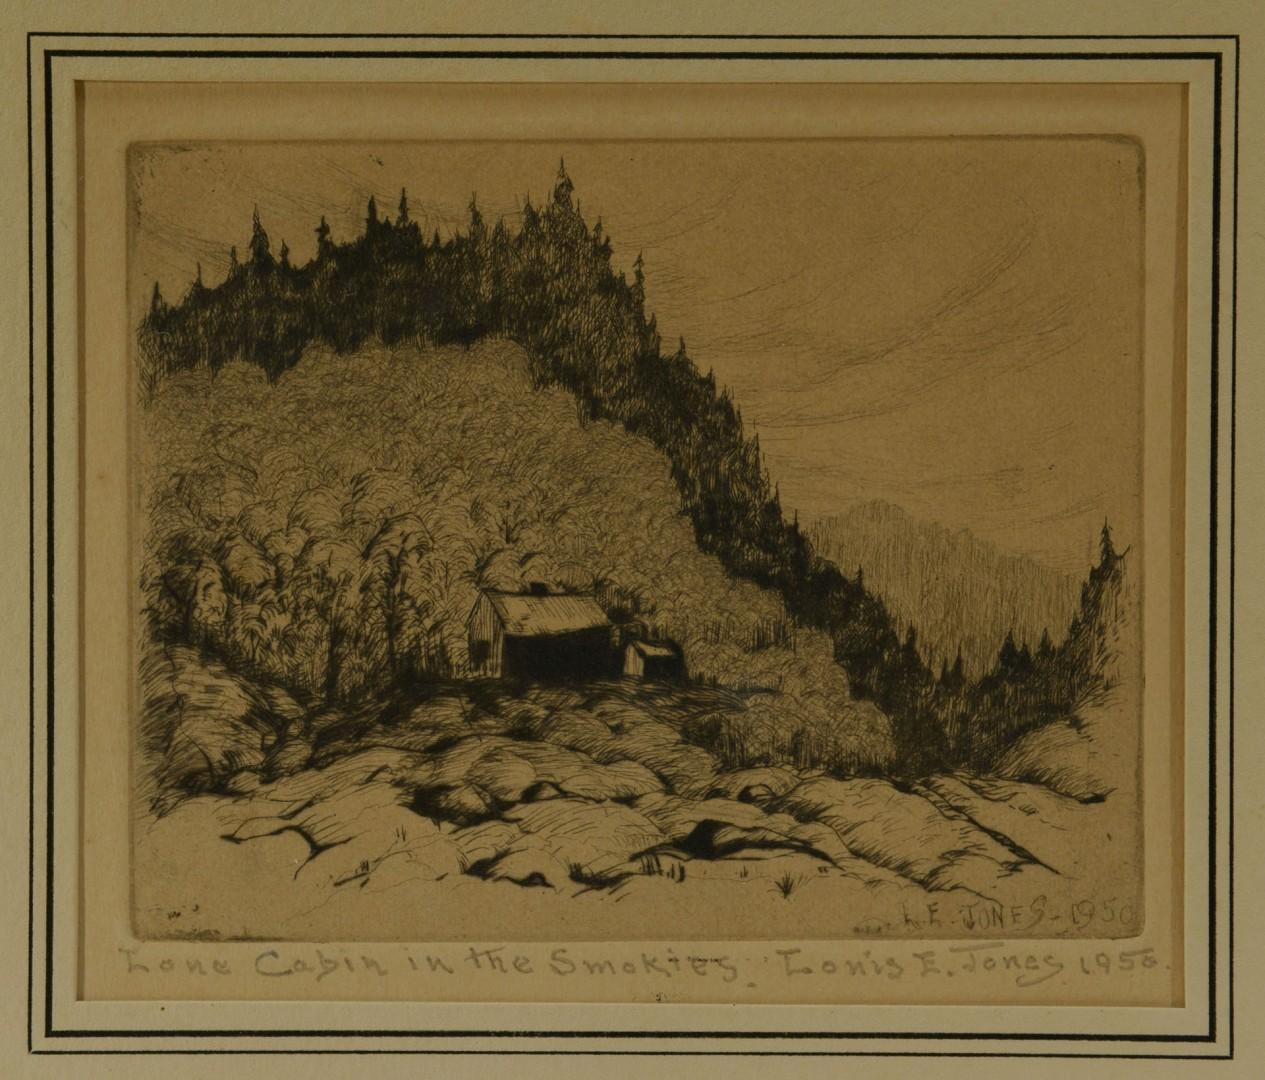 Lot 48: Pair of Louis E. Jones Etchings